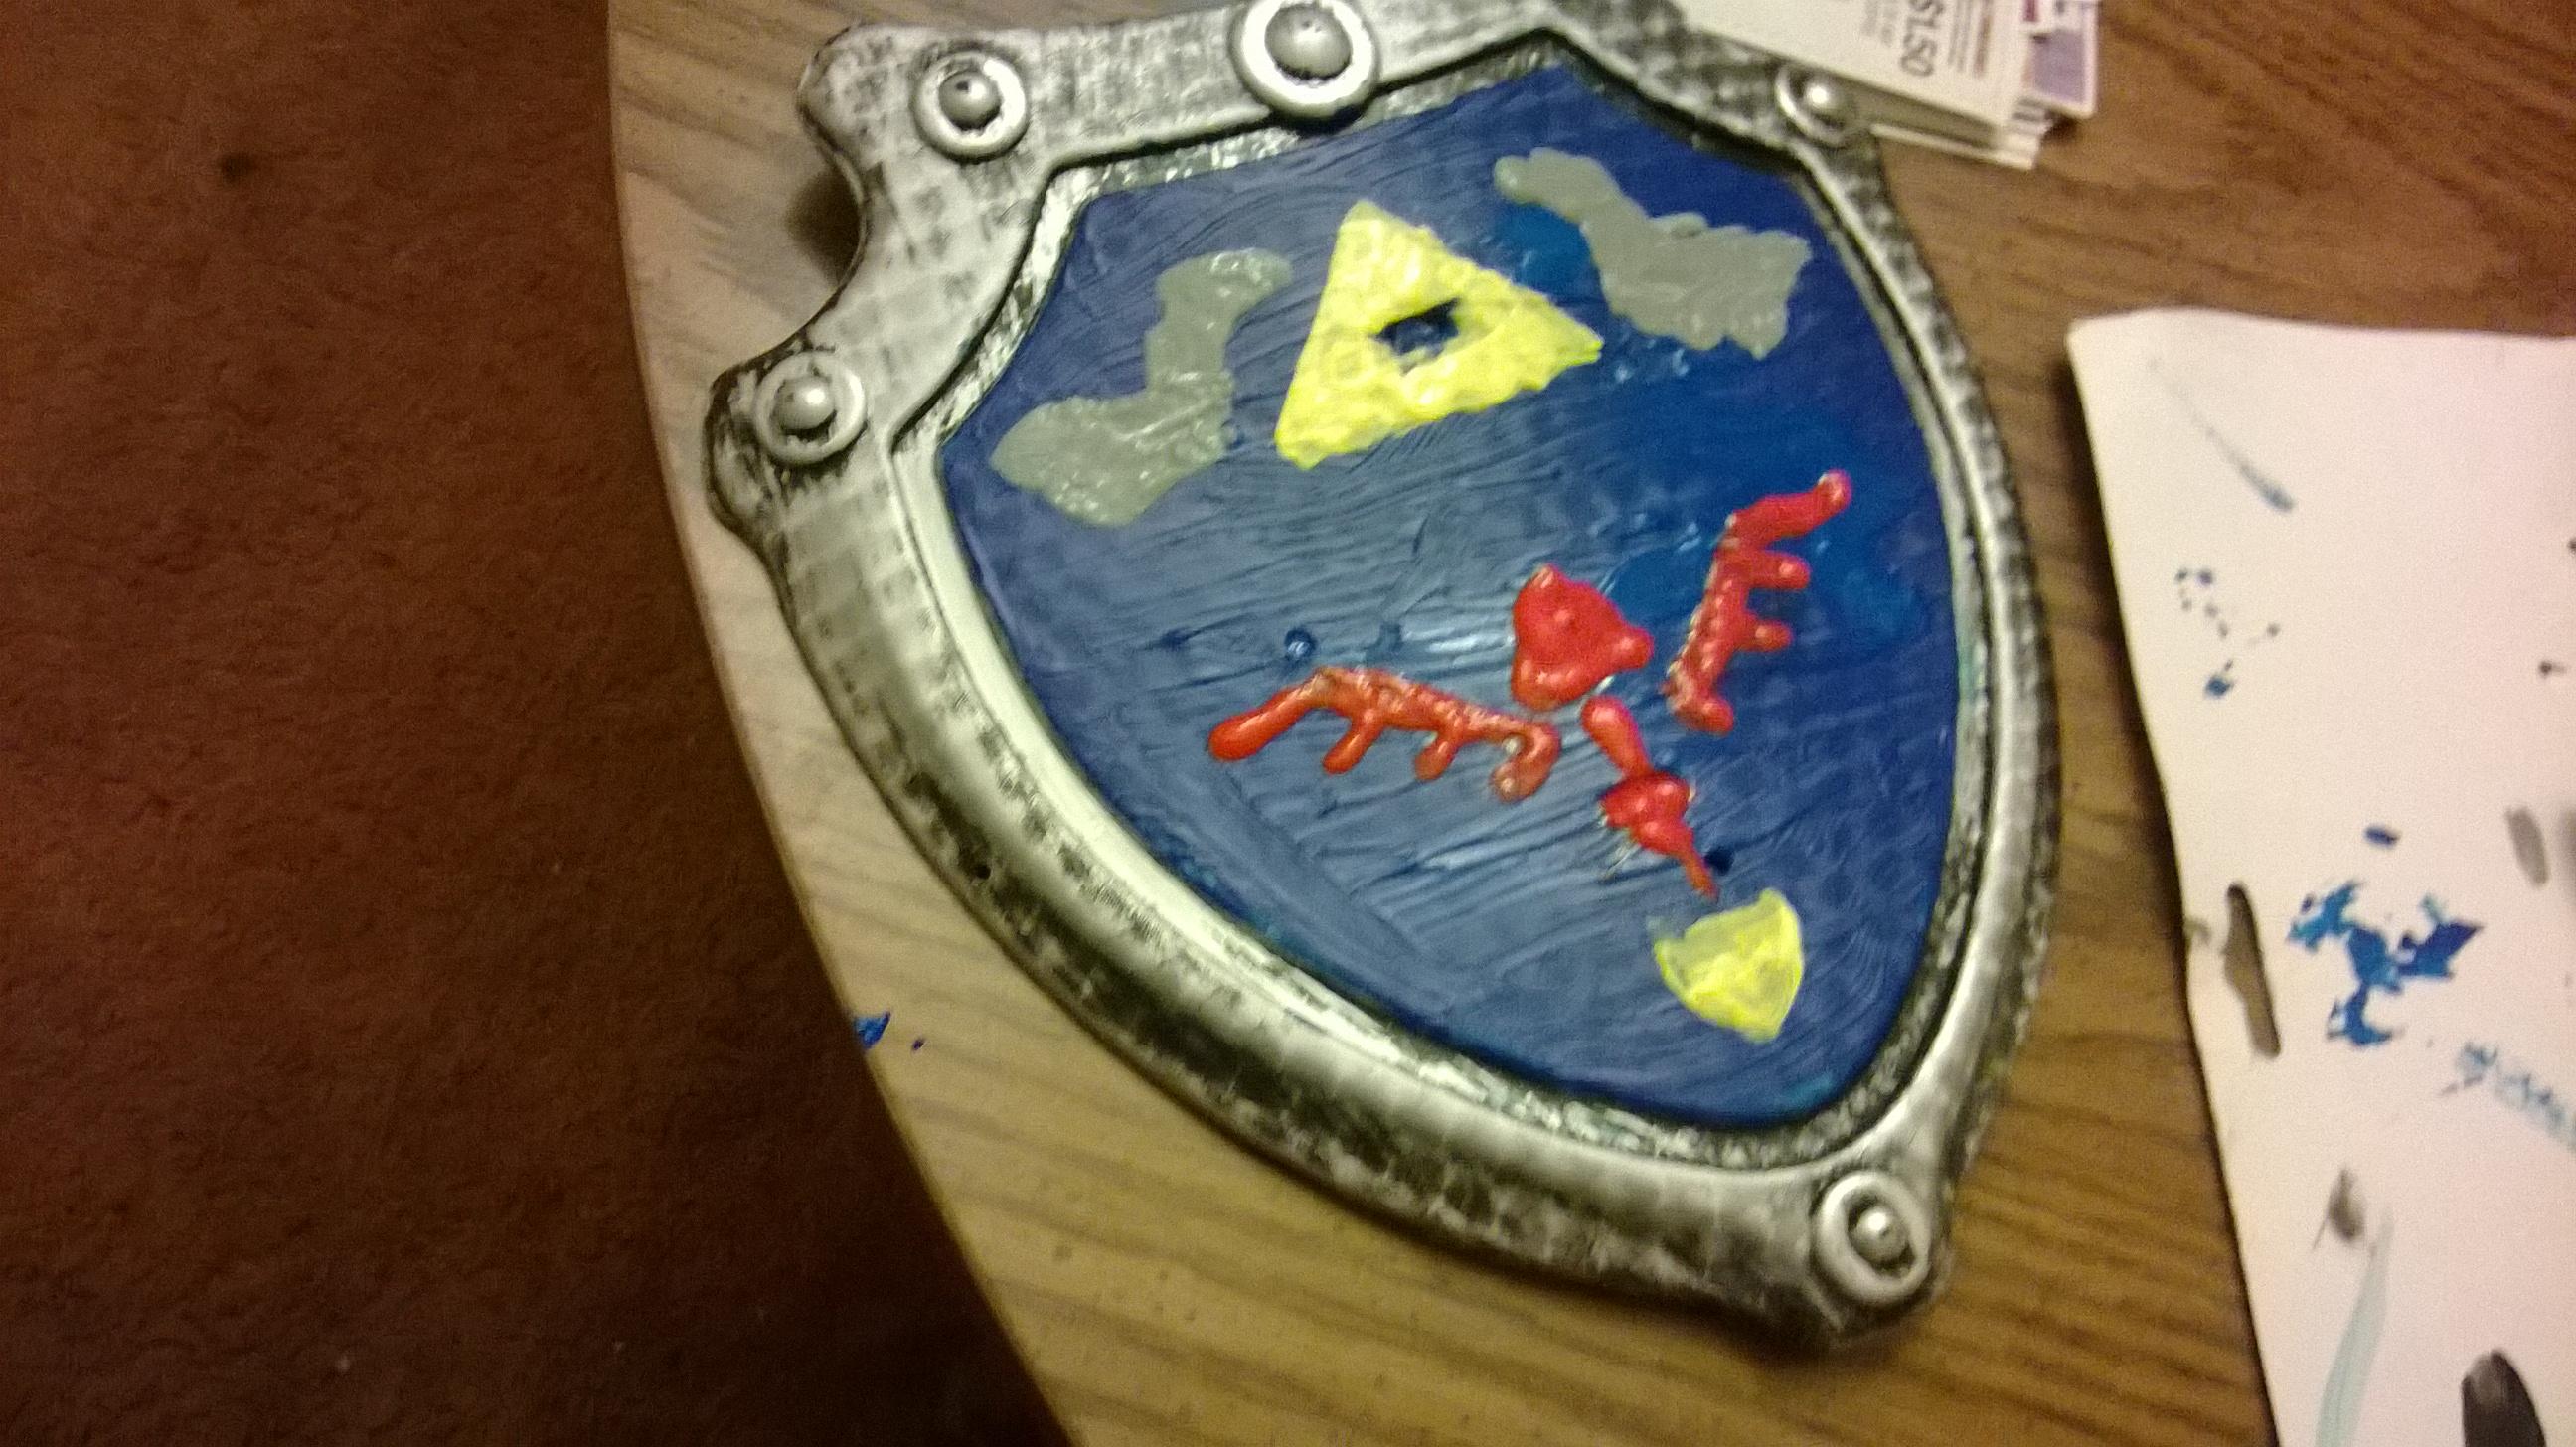 The $4 Hylian Shield